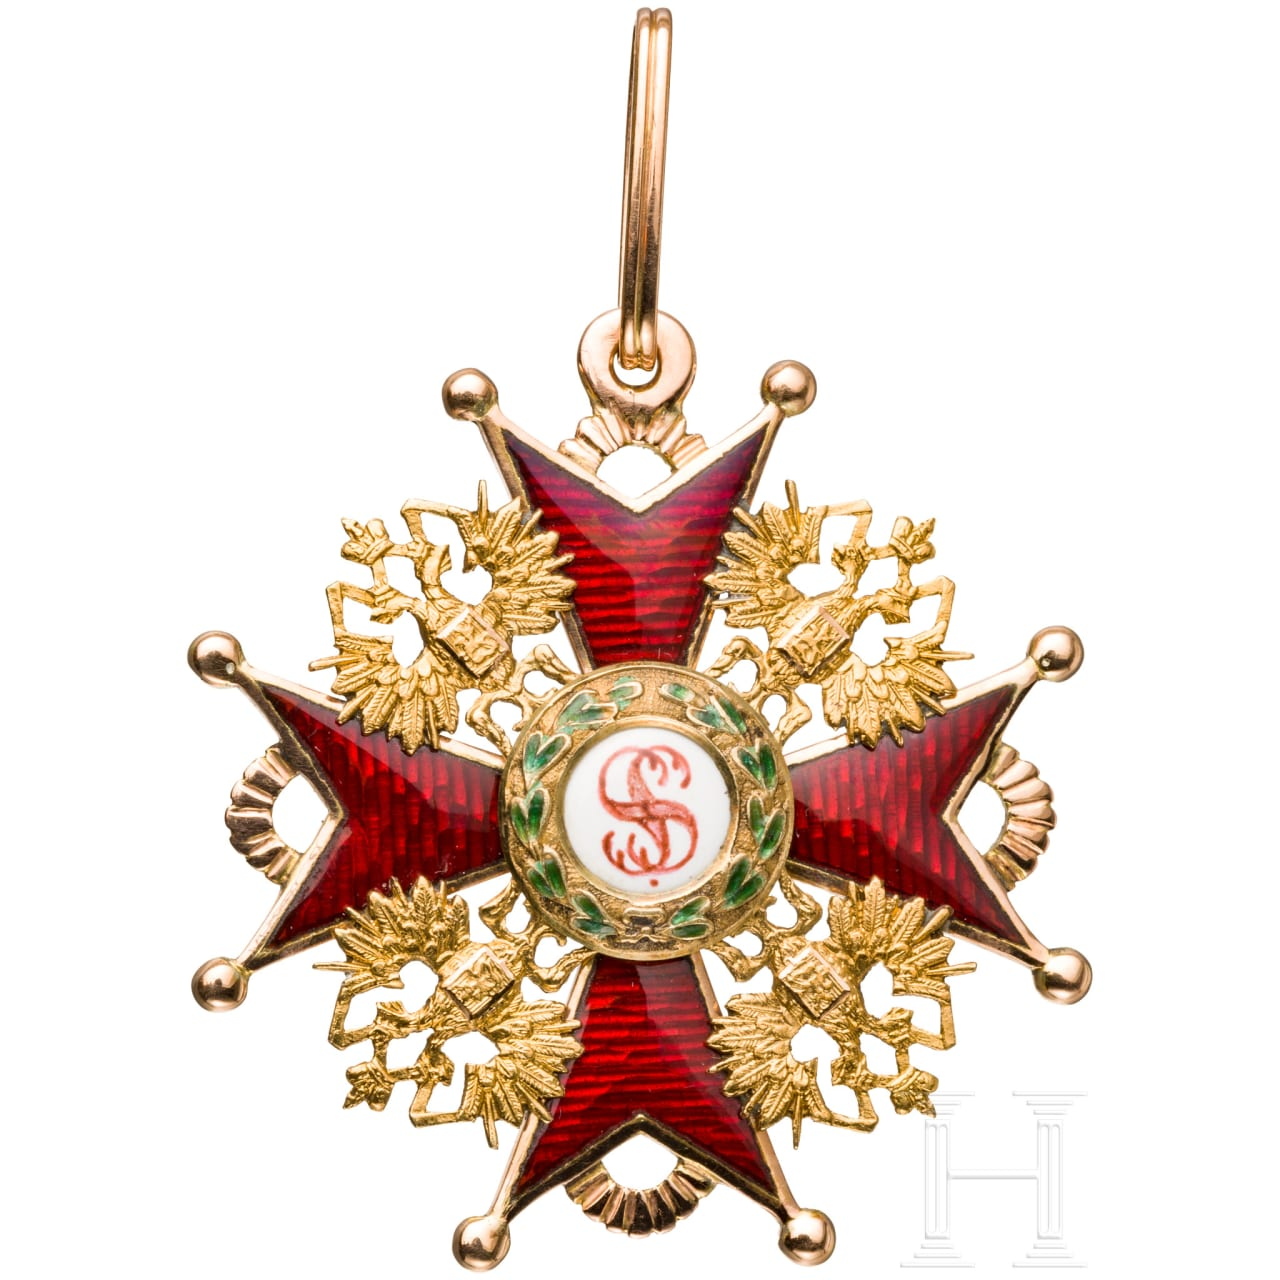 Order of Saint Stanislaus, 3rd class cross, dated 1863